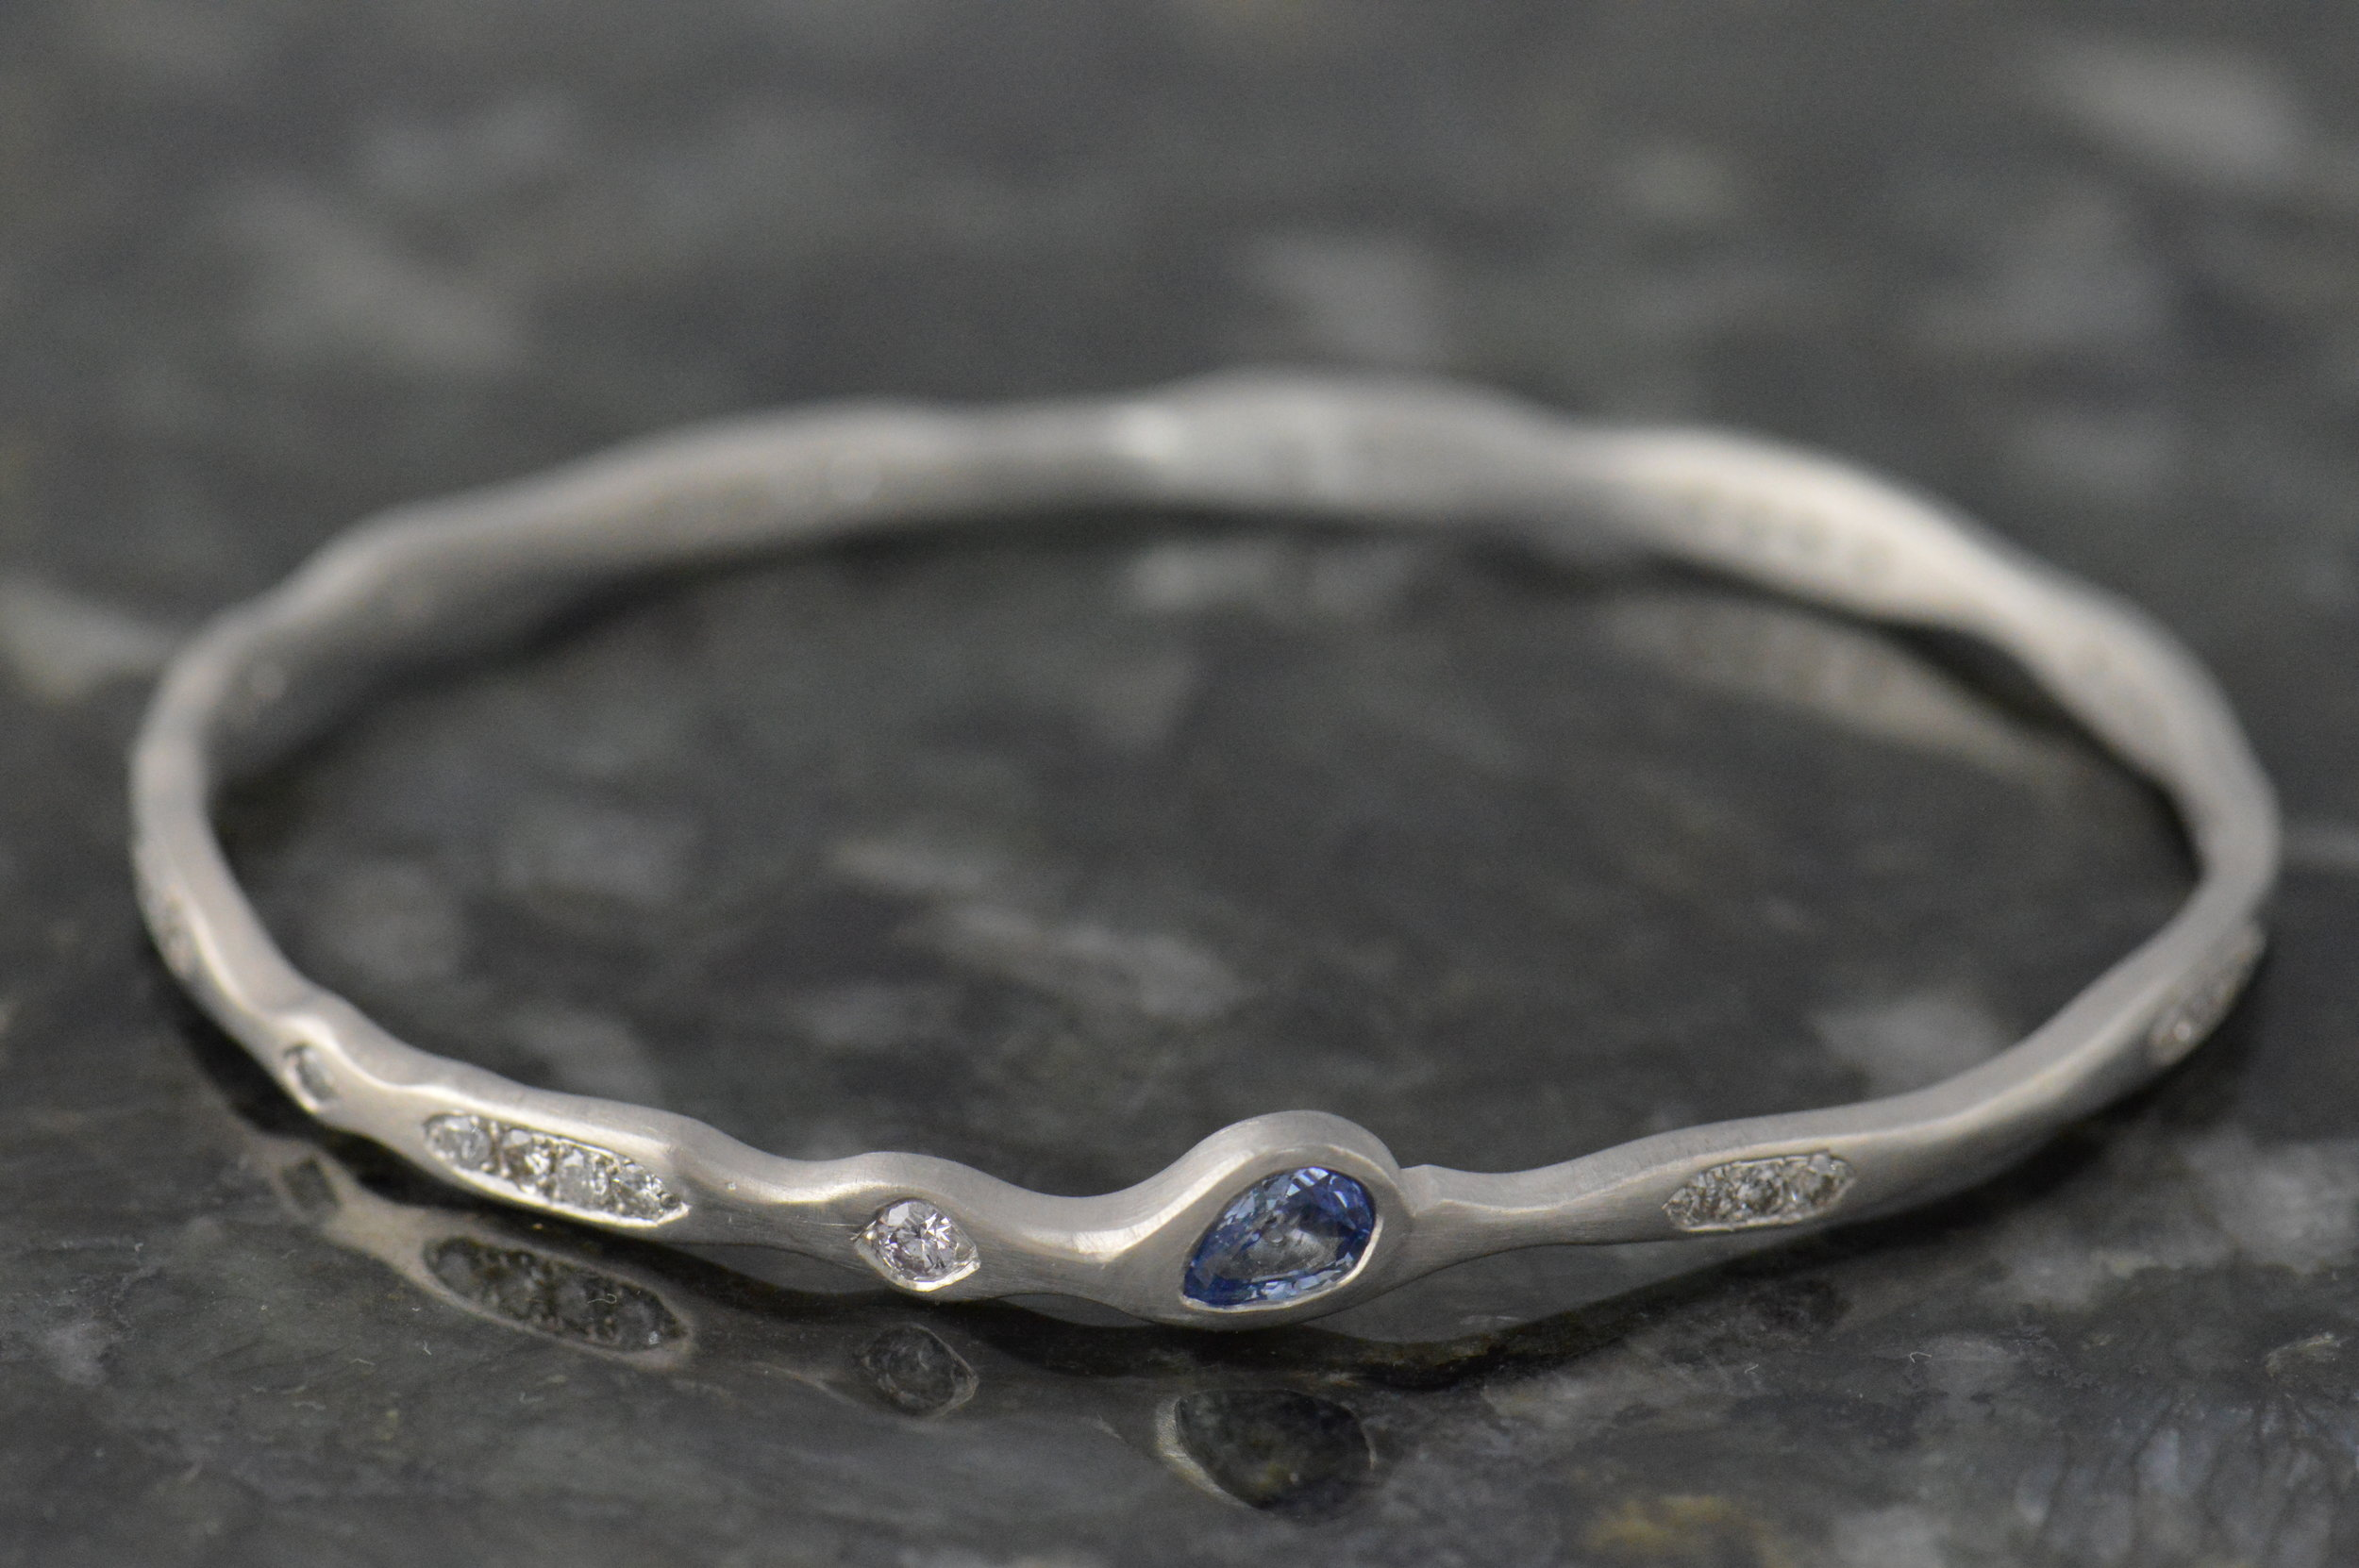 darvier-cuff-bracelet-sapphire-diamonds-hewn.JPG